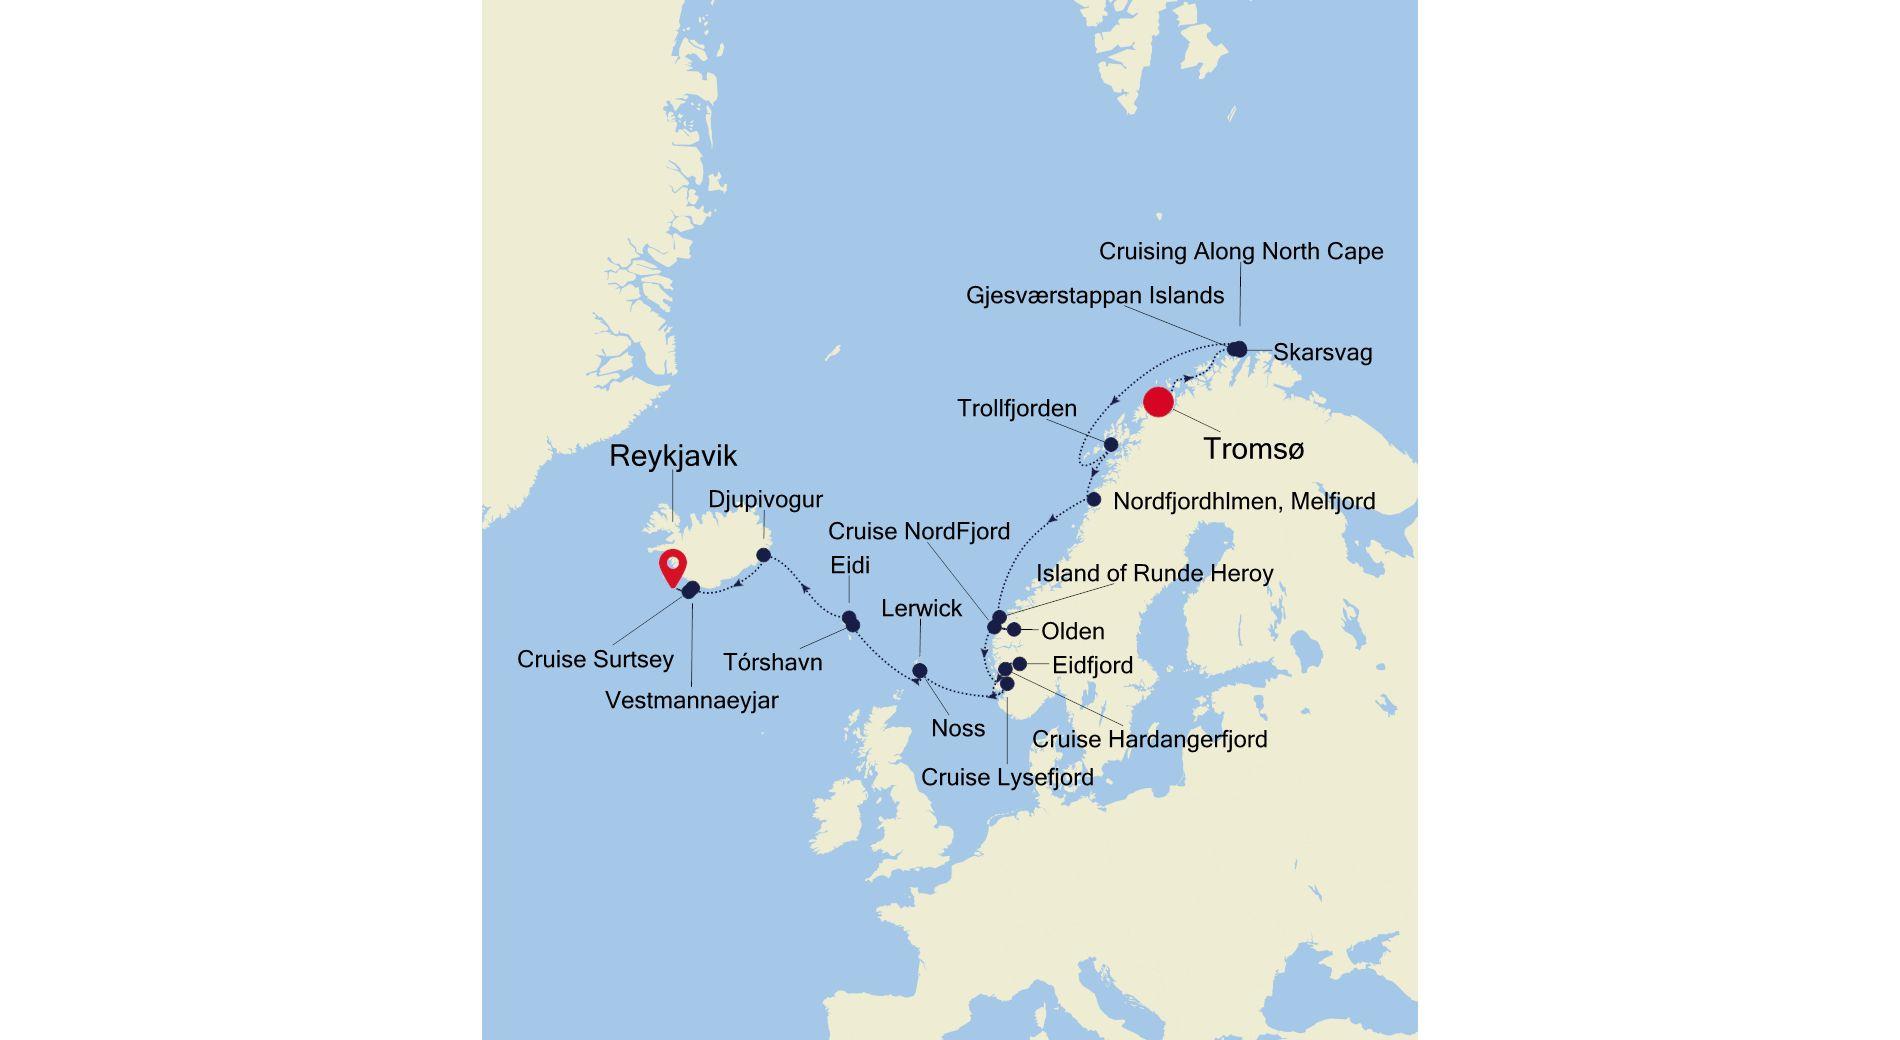 E4210716013 - Tromsø nach Reykjavik